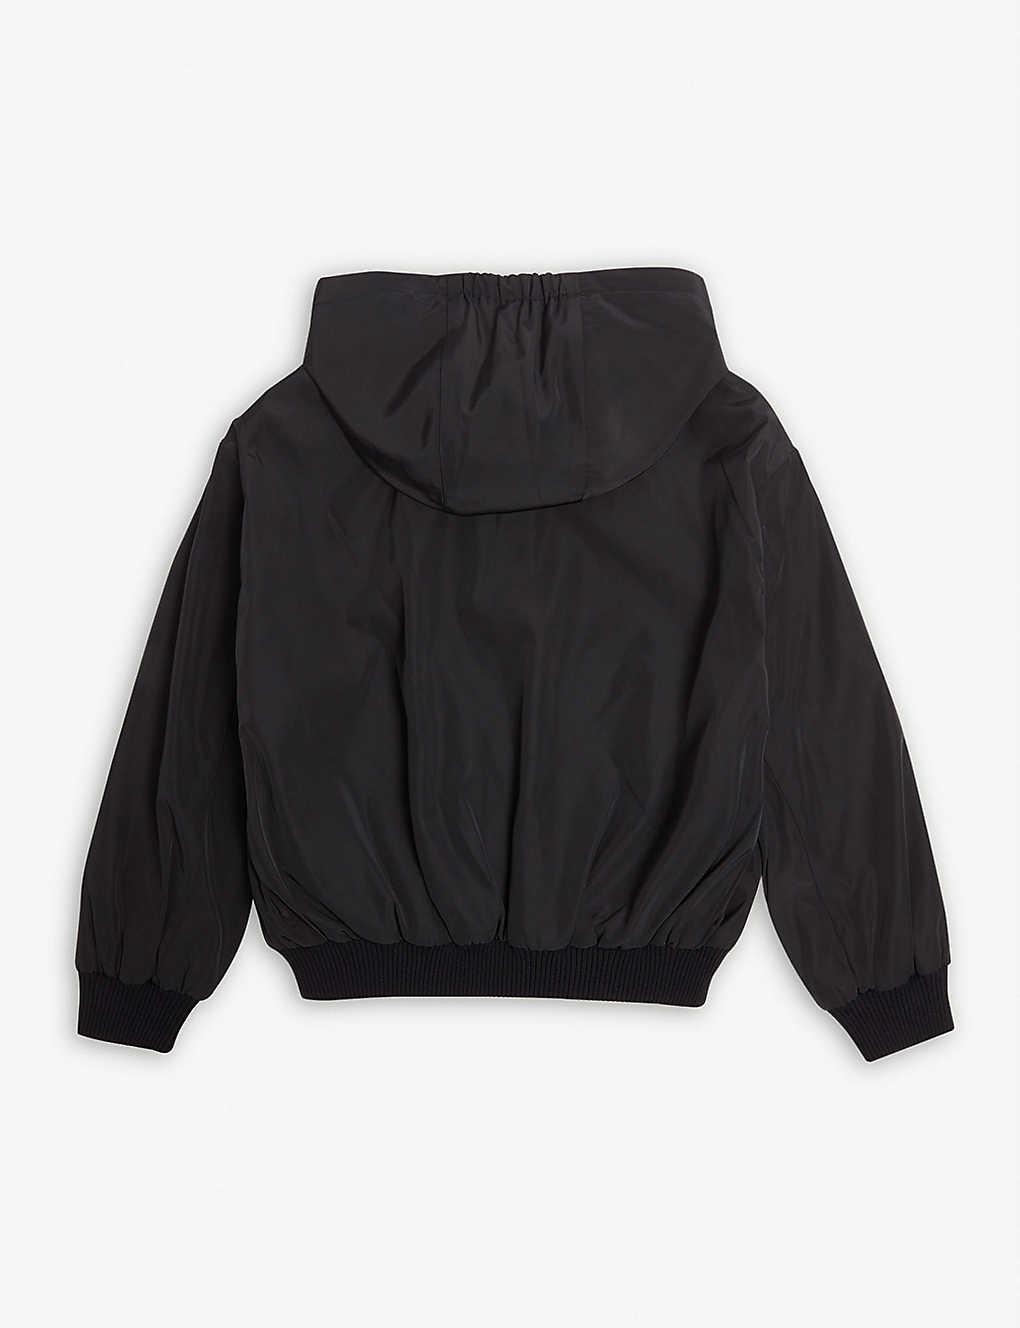 fbae2380abe32 ... Tommy reversible Icon stripe jacket 6-14 years - Black stripe